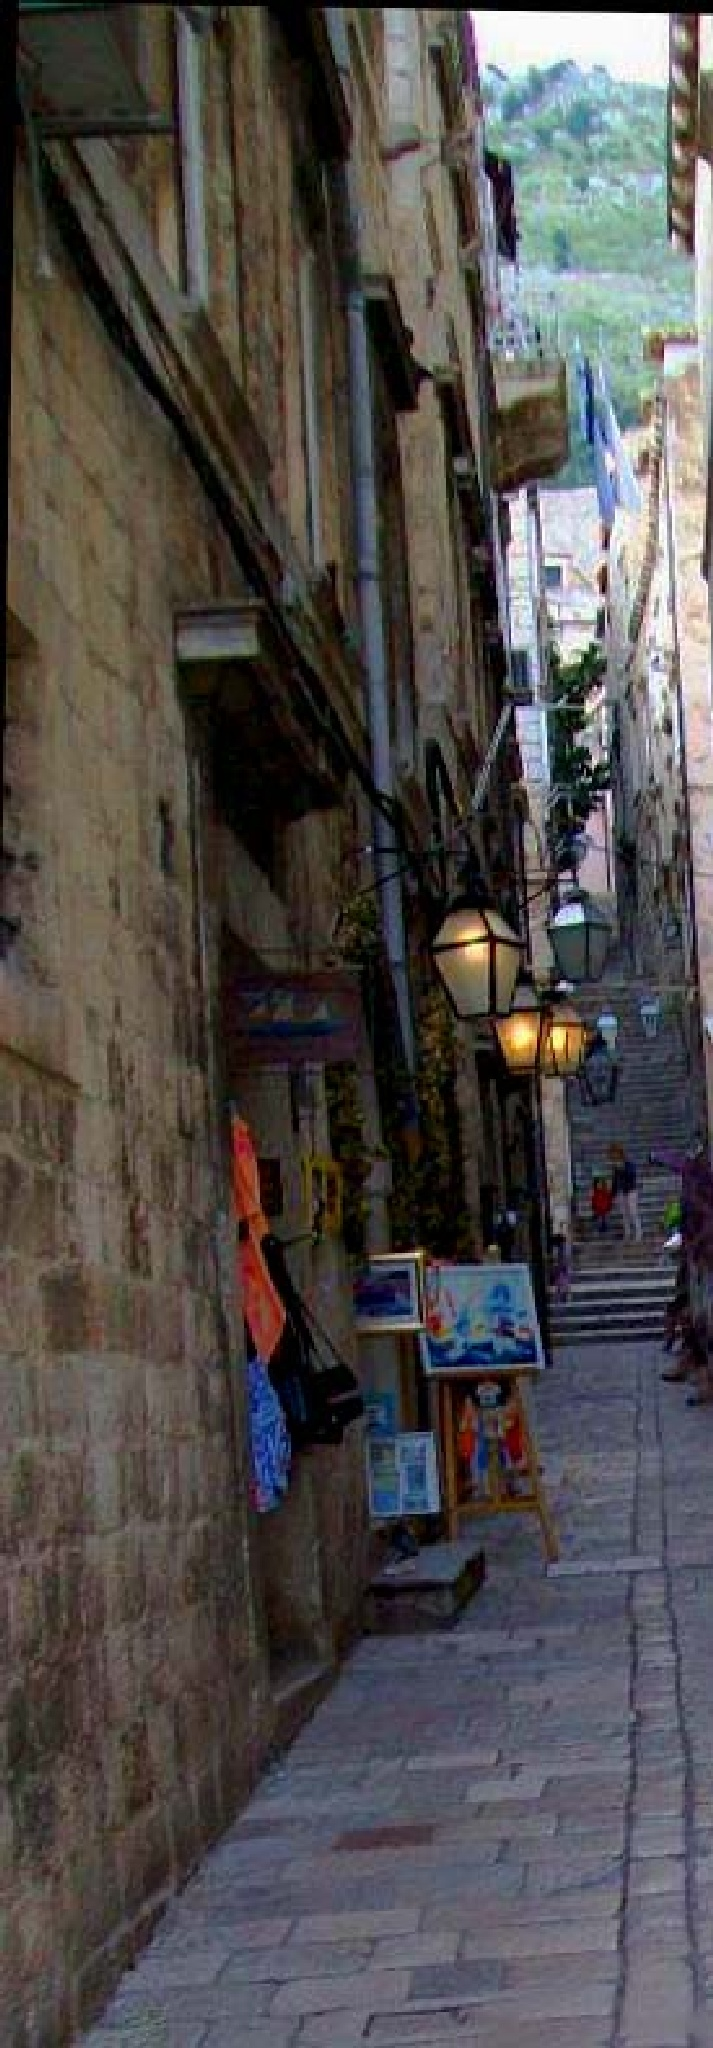 Dubrovnik with specific narrow street , Croatia by mirka_p